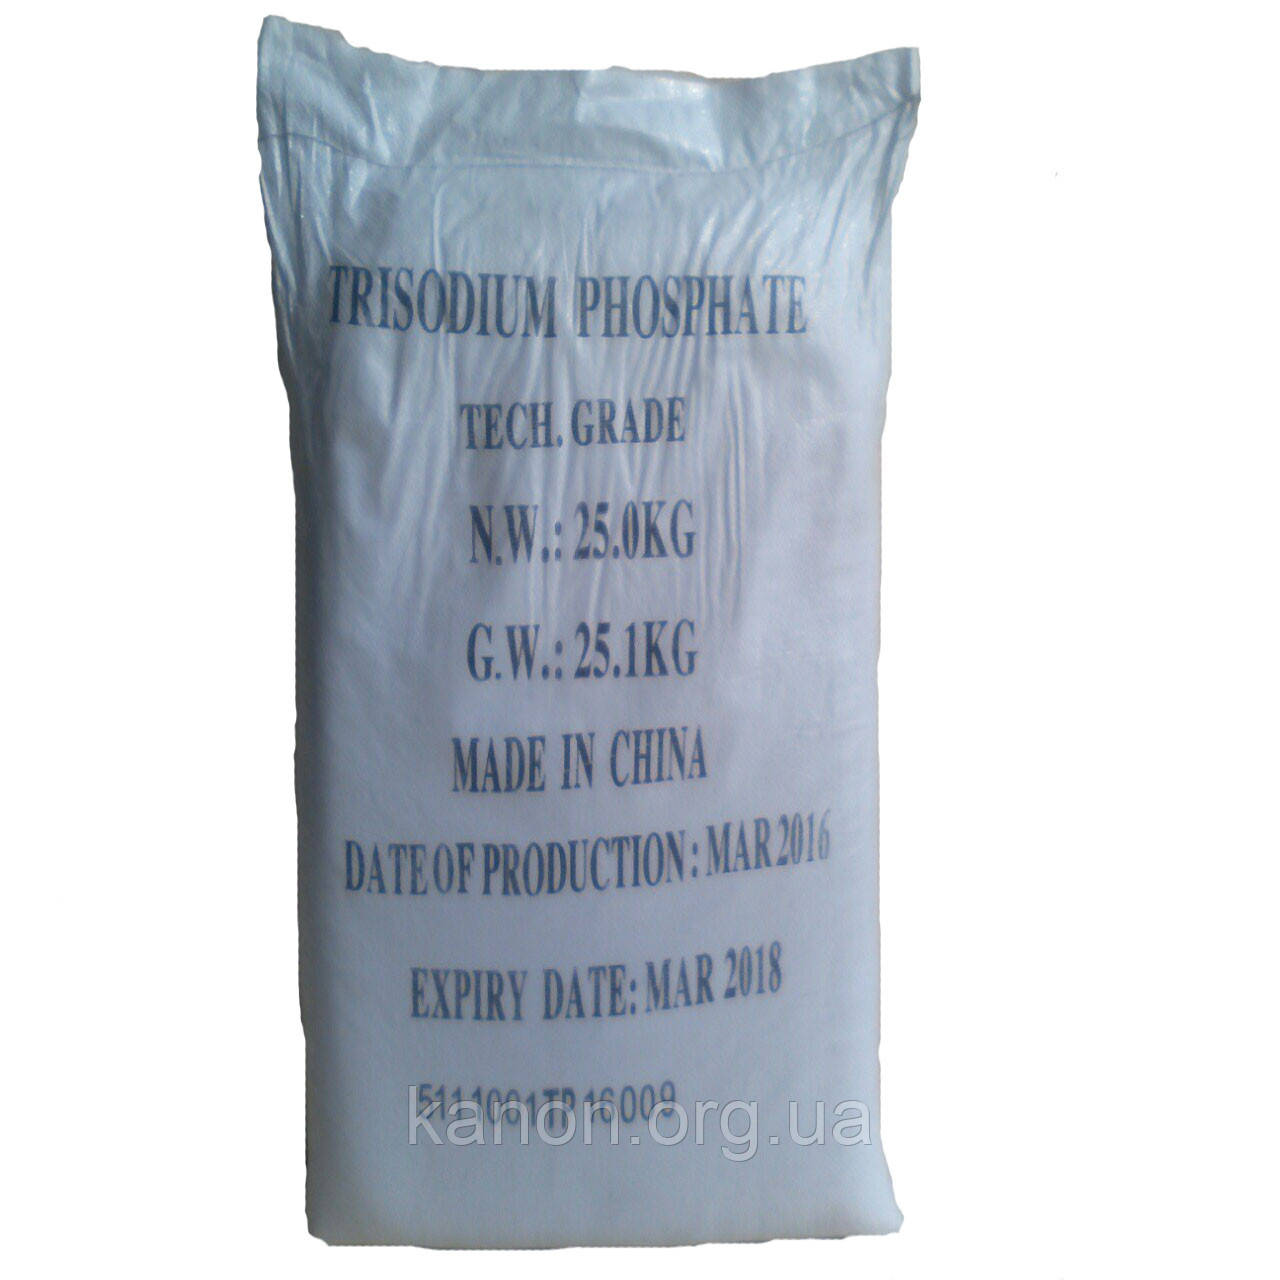 Тринатрієвий фосфат